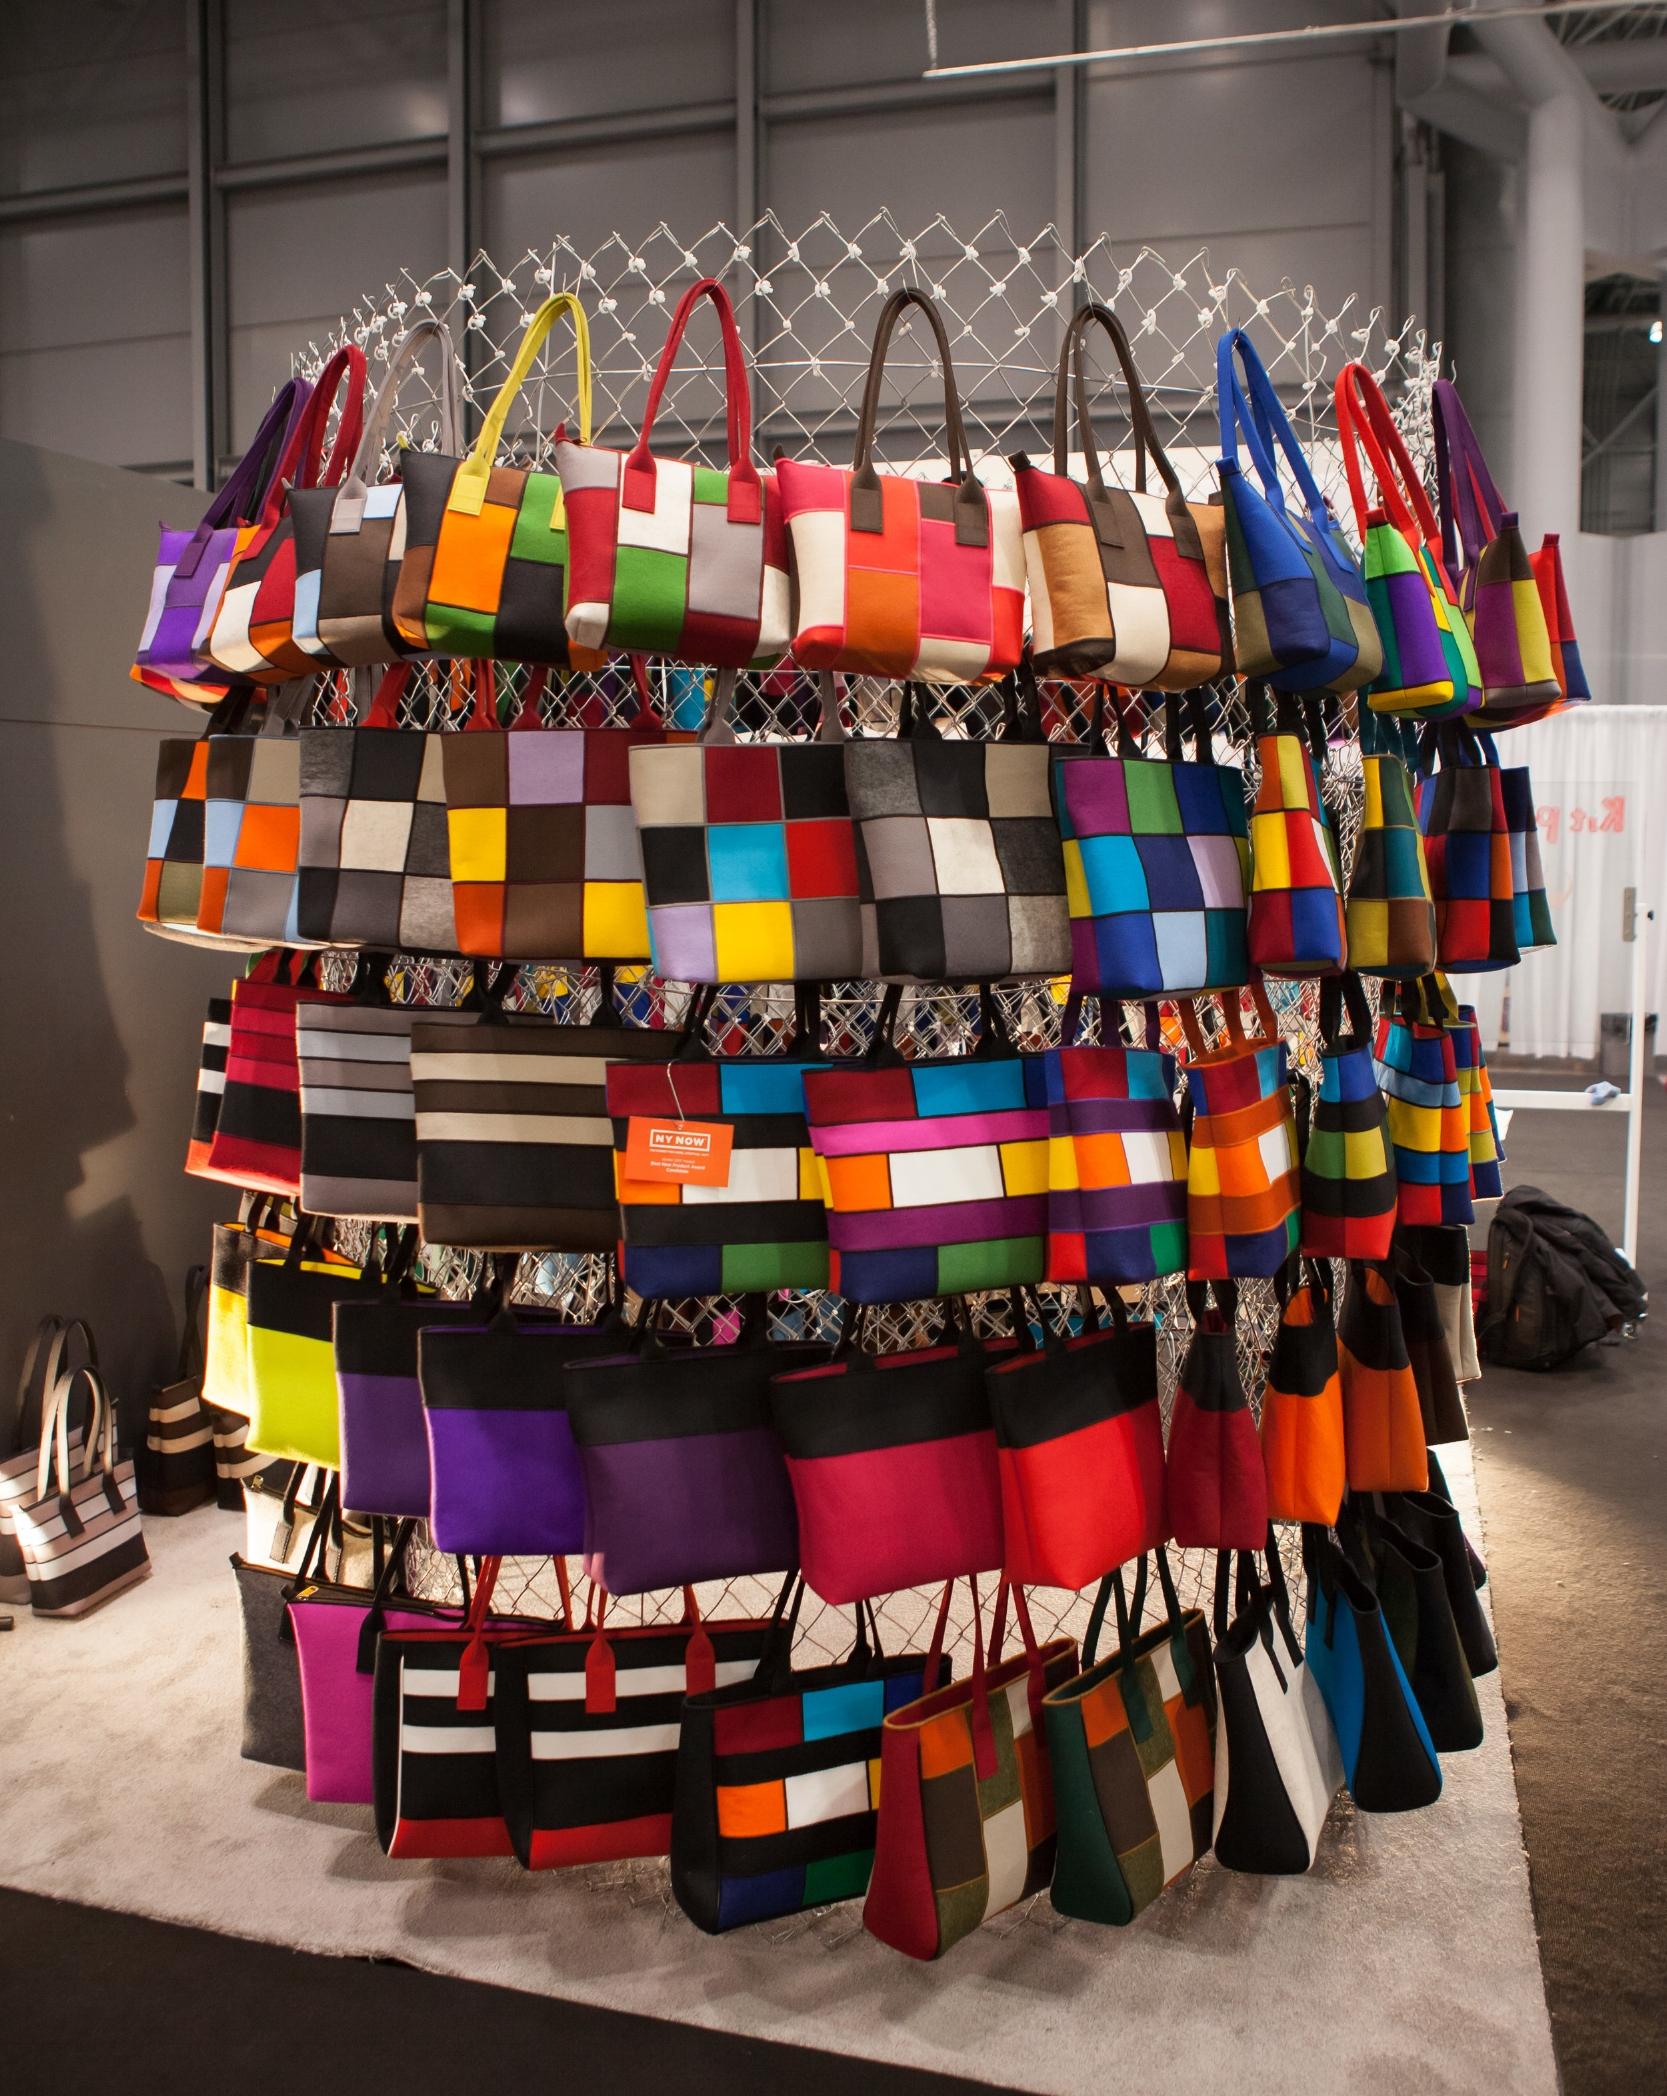 Rayer handbags.